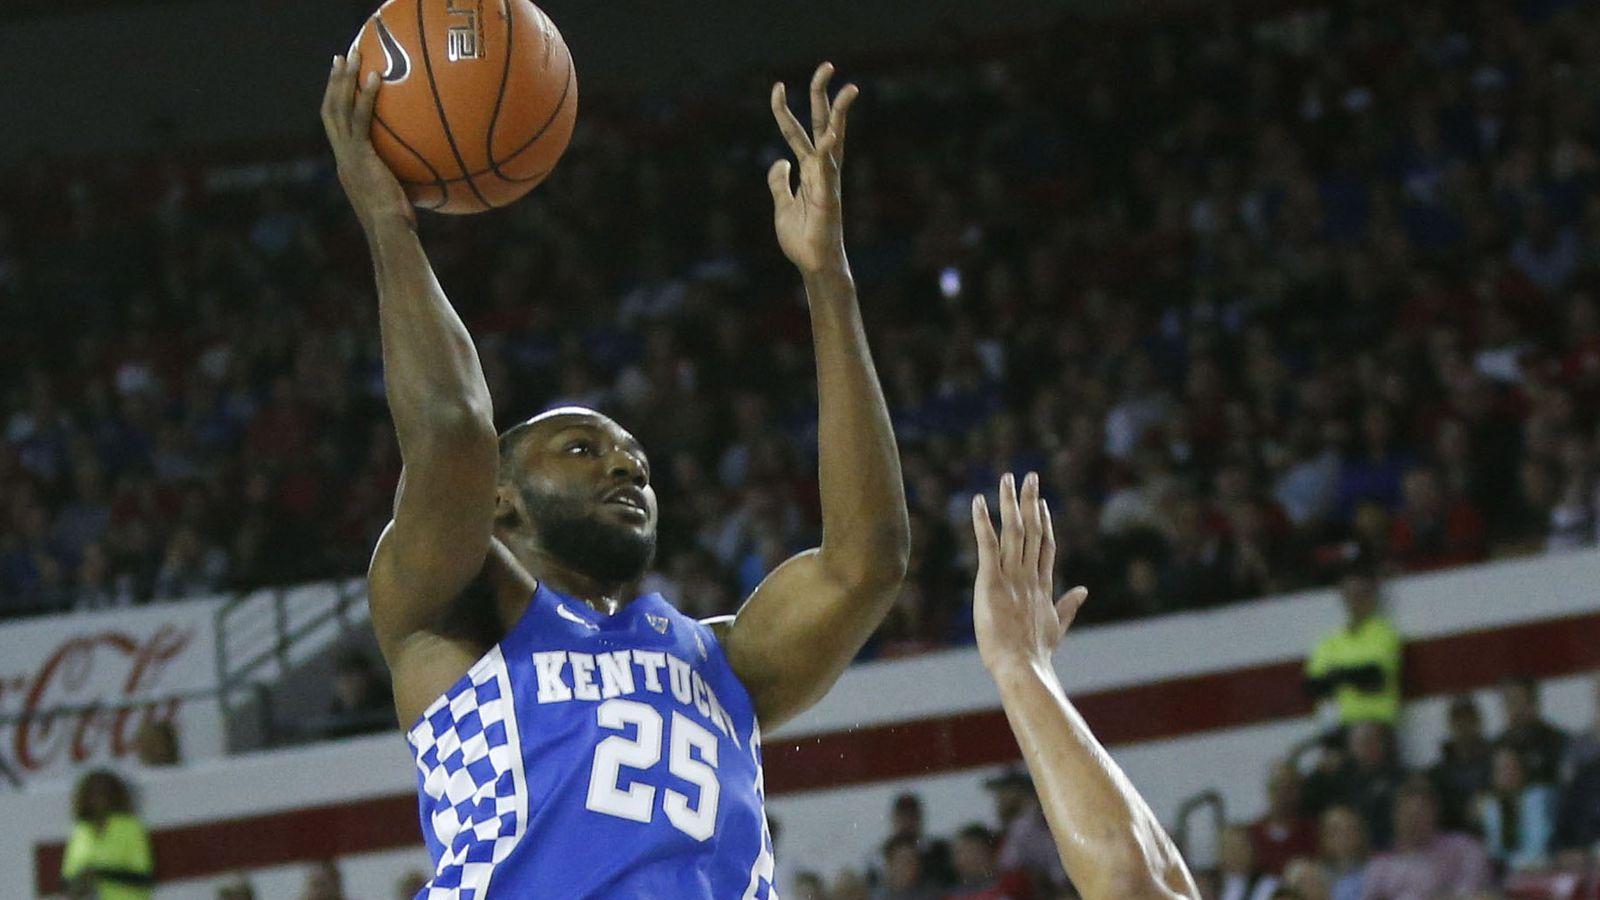 Kentucky Basketball Highlights And Box Score From Historic: Kentucky Basketball Box Score And Highlights From Thriller